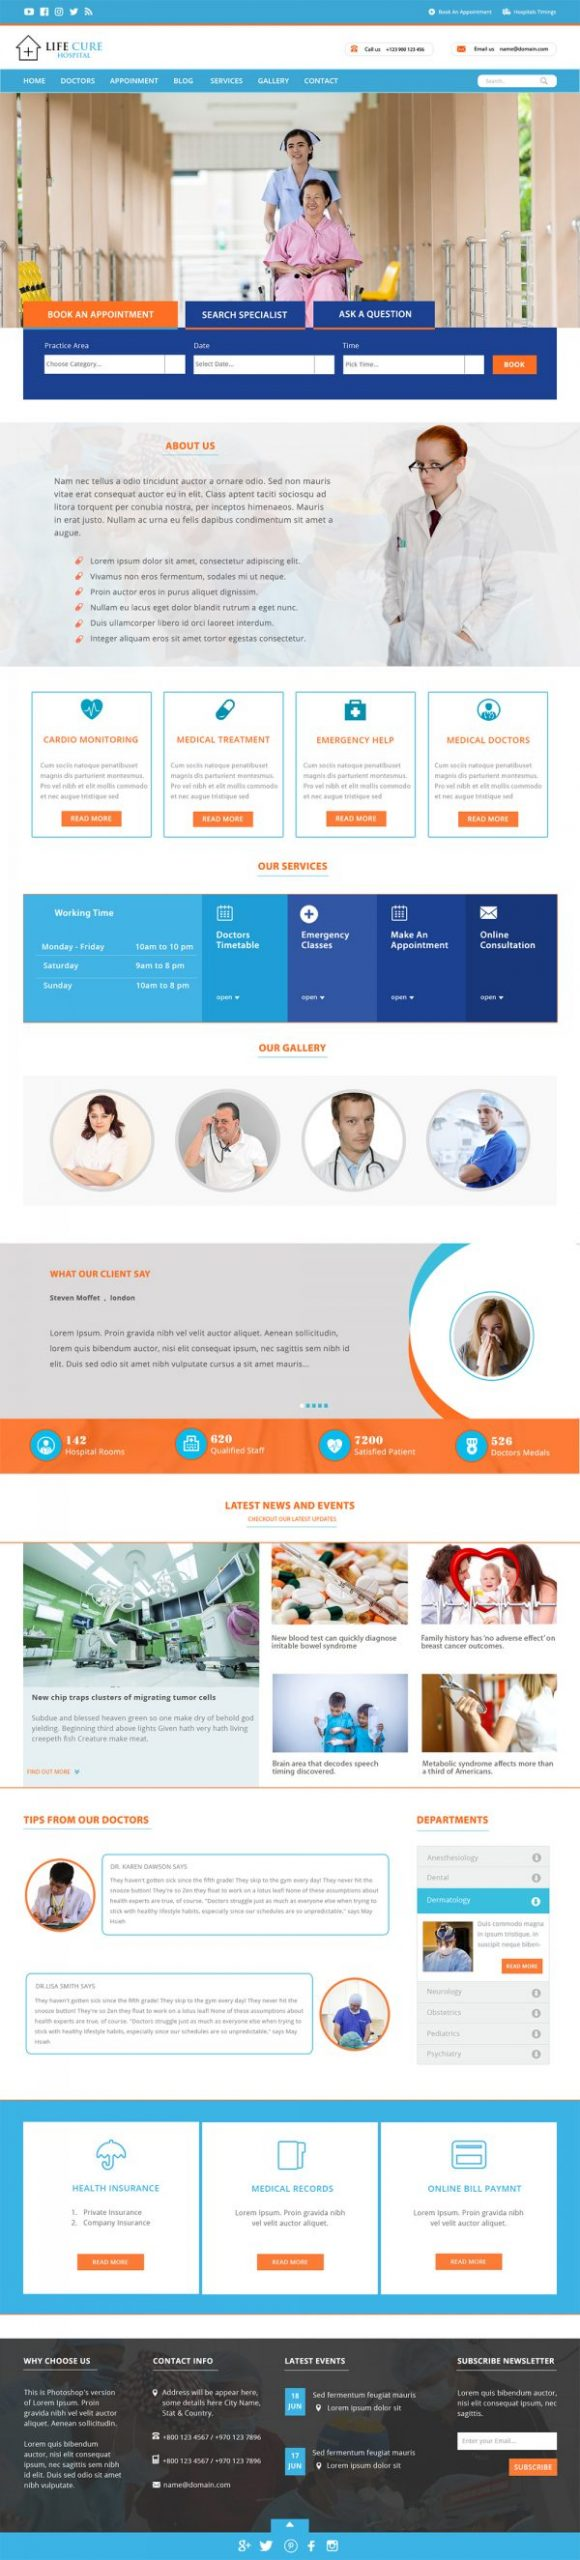 Hospital WordPress Template